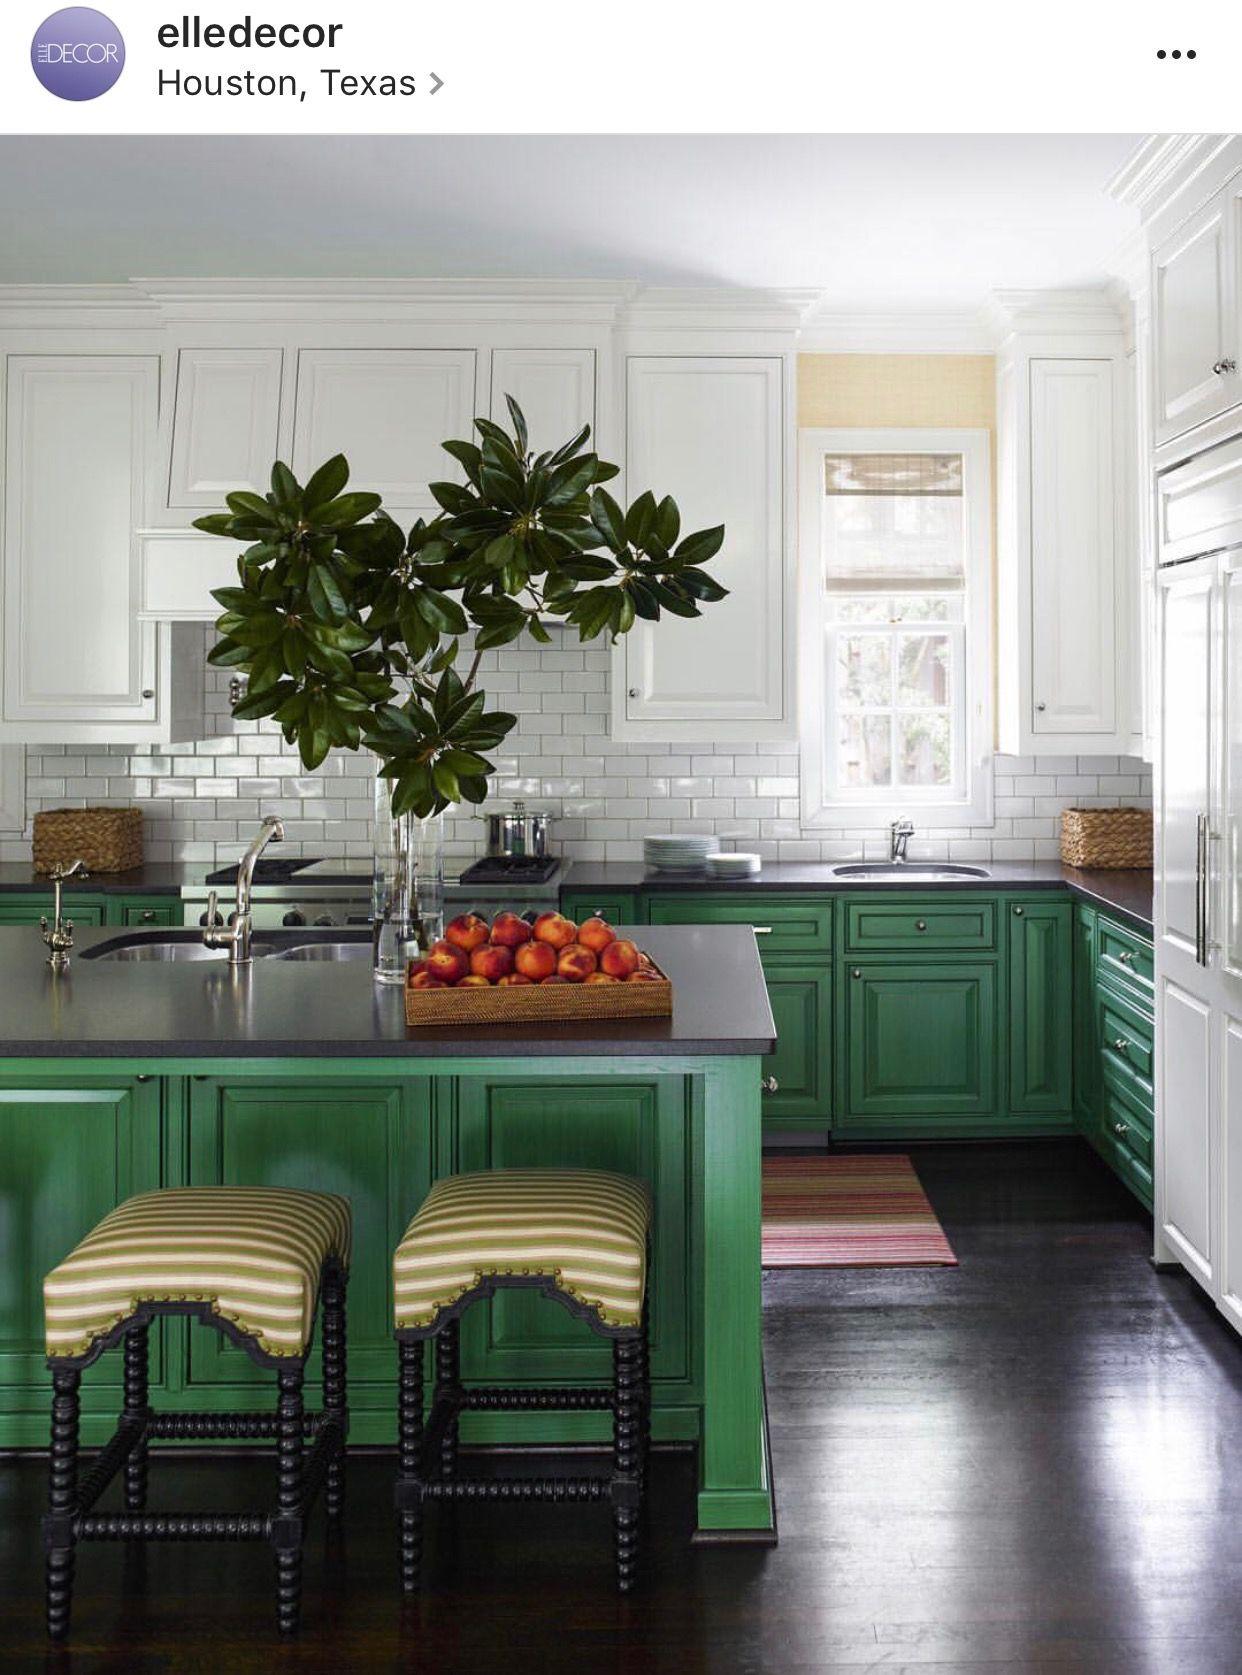 pin by kim on interiors kitchens green kitchen cabinets upper kitchen cabinets kitchen on kitchen interior green id=22525